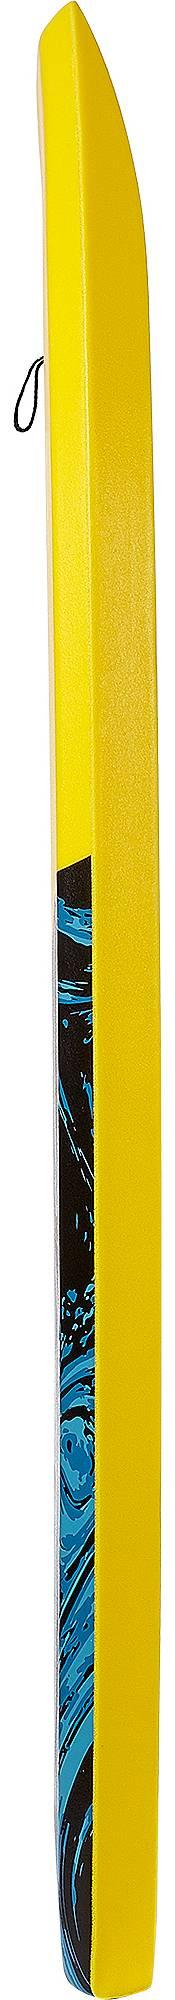 "DBX 44"" Bodyboard product image"